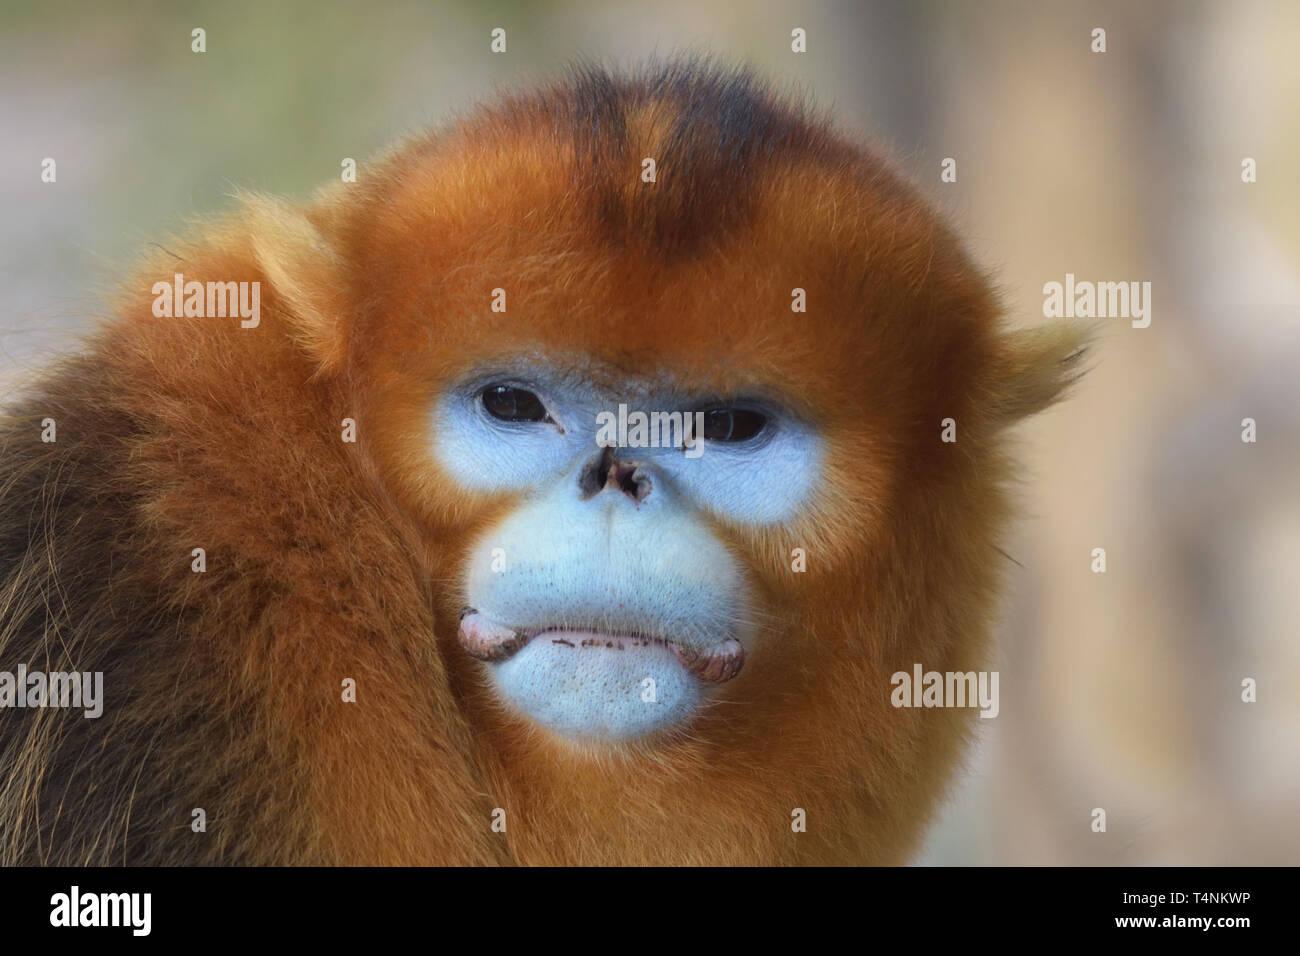 Male Golden Snub-nosed Monkey (Rhinopithecus roxellana) in the Chinese mountains. - Stock Image